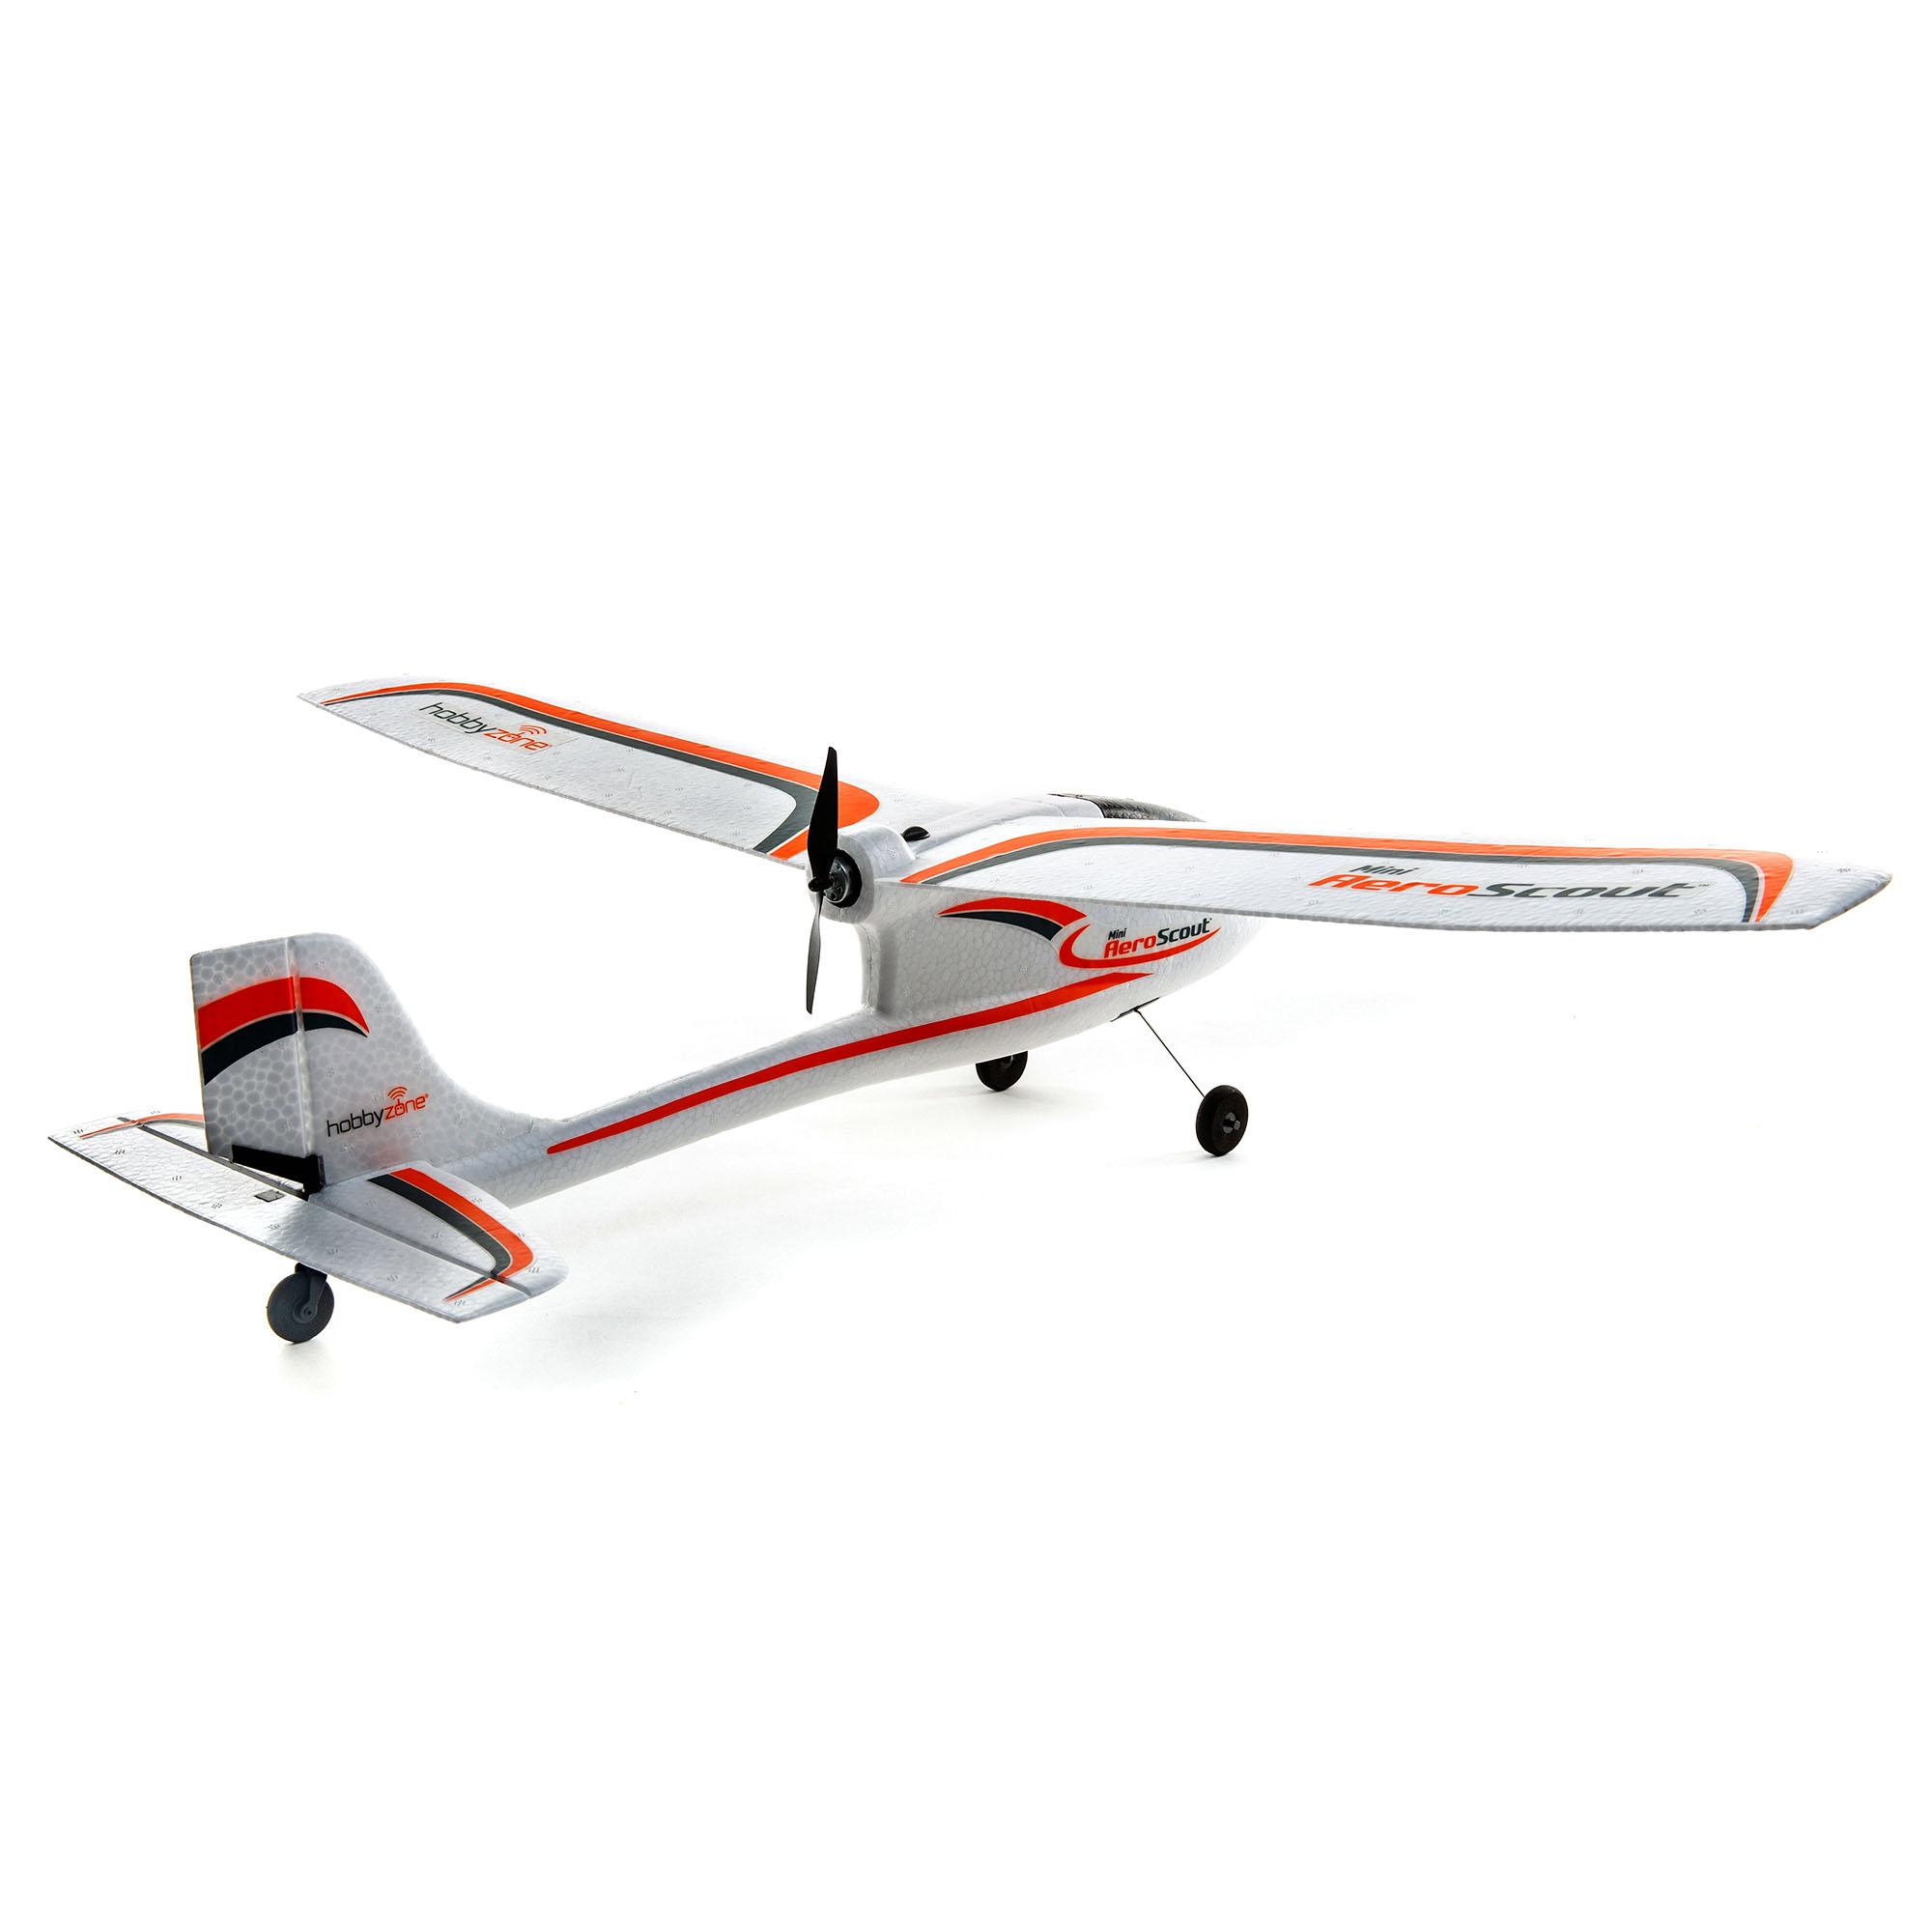 Mini AeroScout hobbyzone